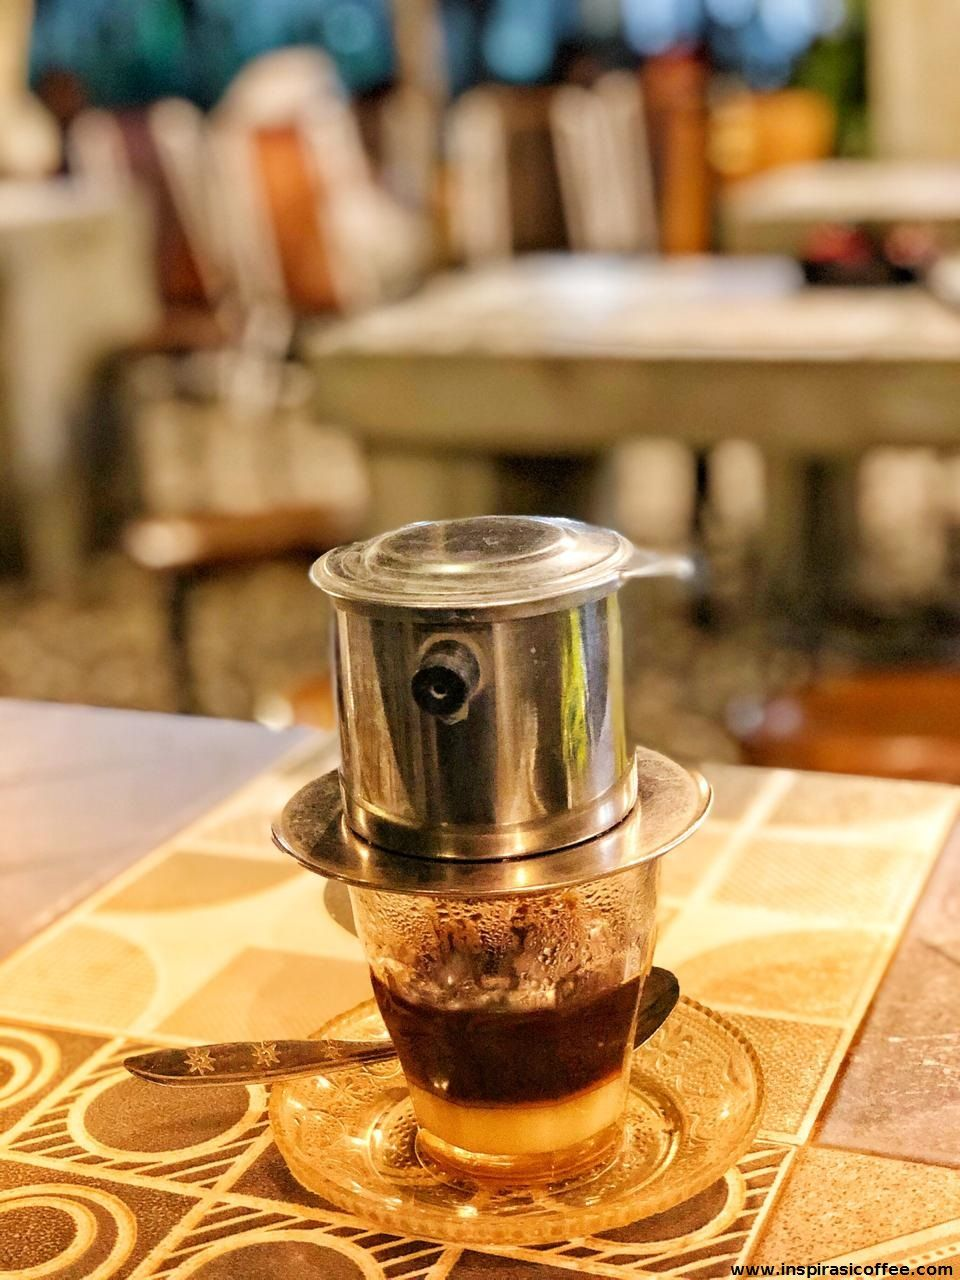 Baru pertama kali nyobain kopi Vietnam Drip. Rasanya wow